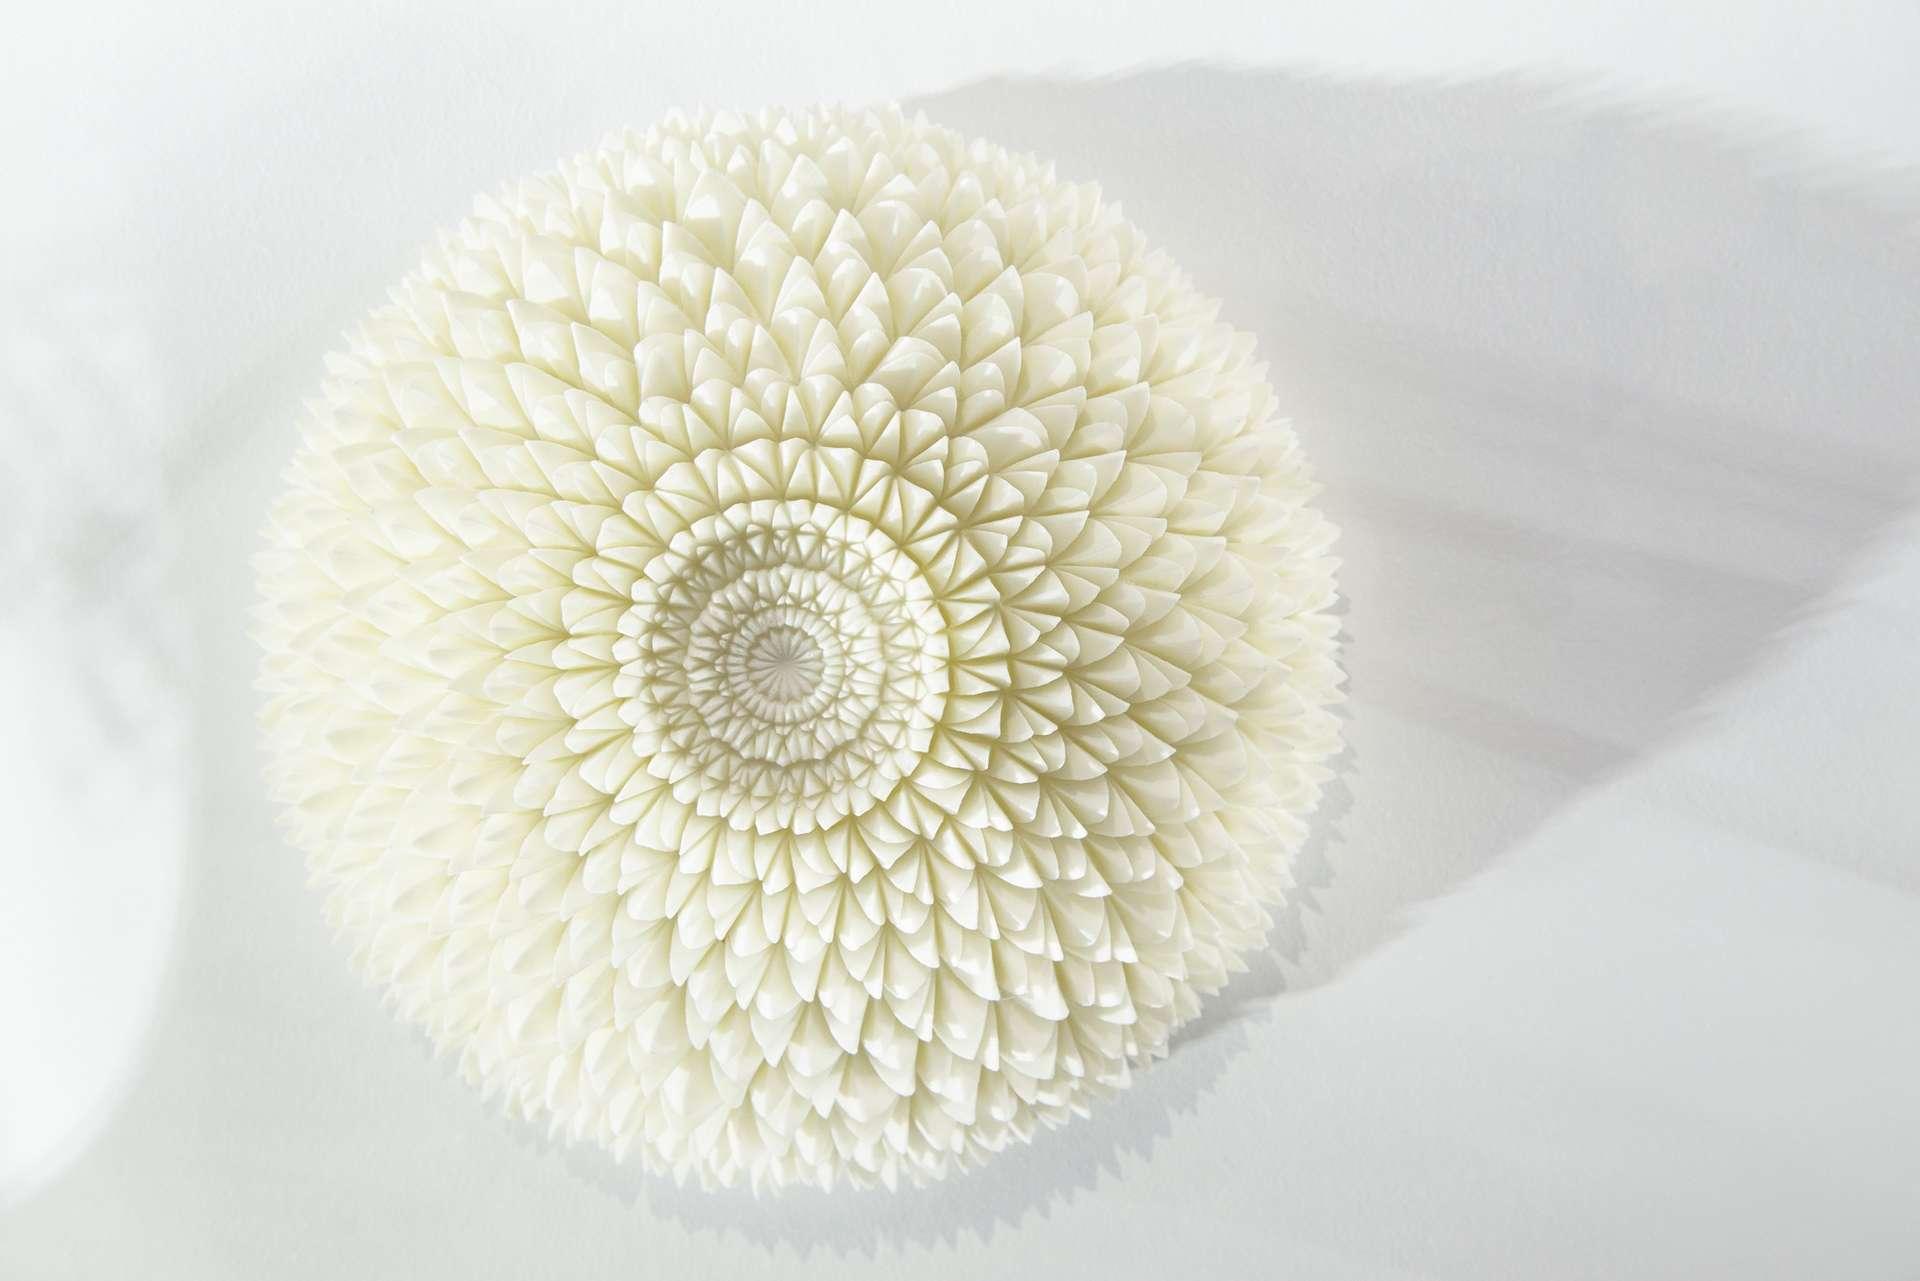 3D printed circular pattern